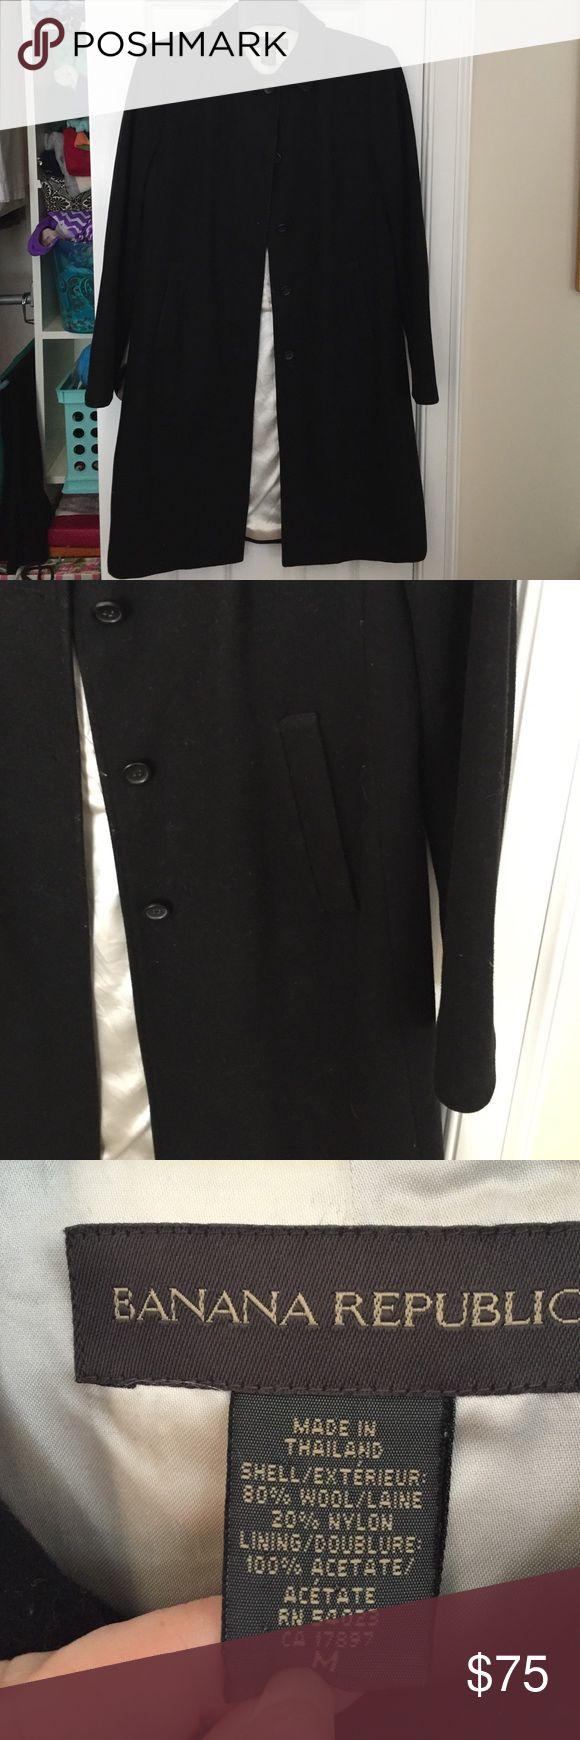 Black wool Banana Republic Coat Beautiful BR wools coat. Classic black, goes from casual to dressy! Banana Republic Jackets & Coats